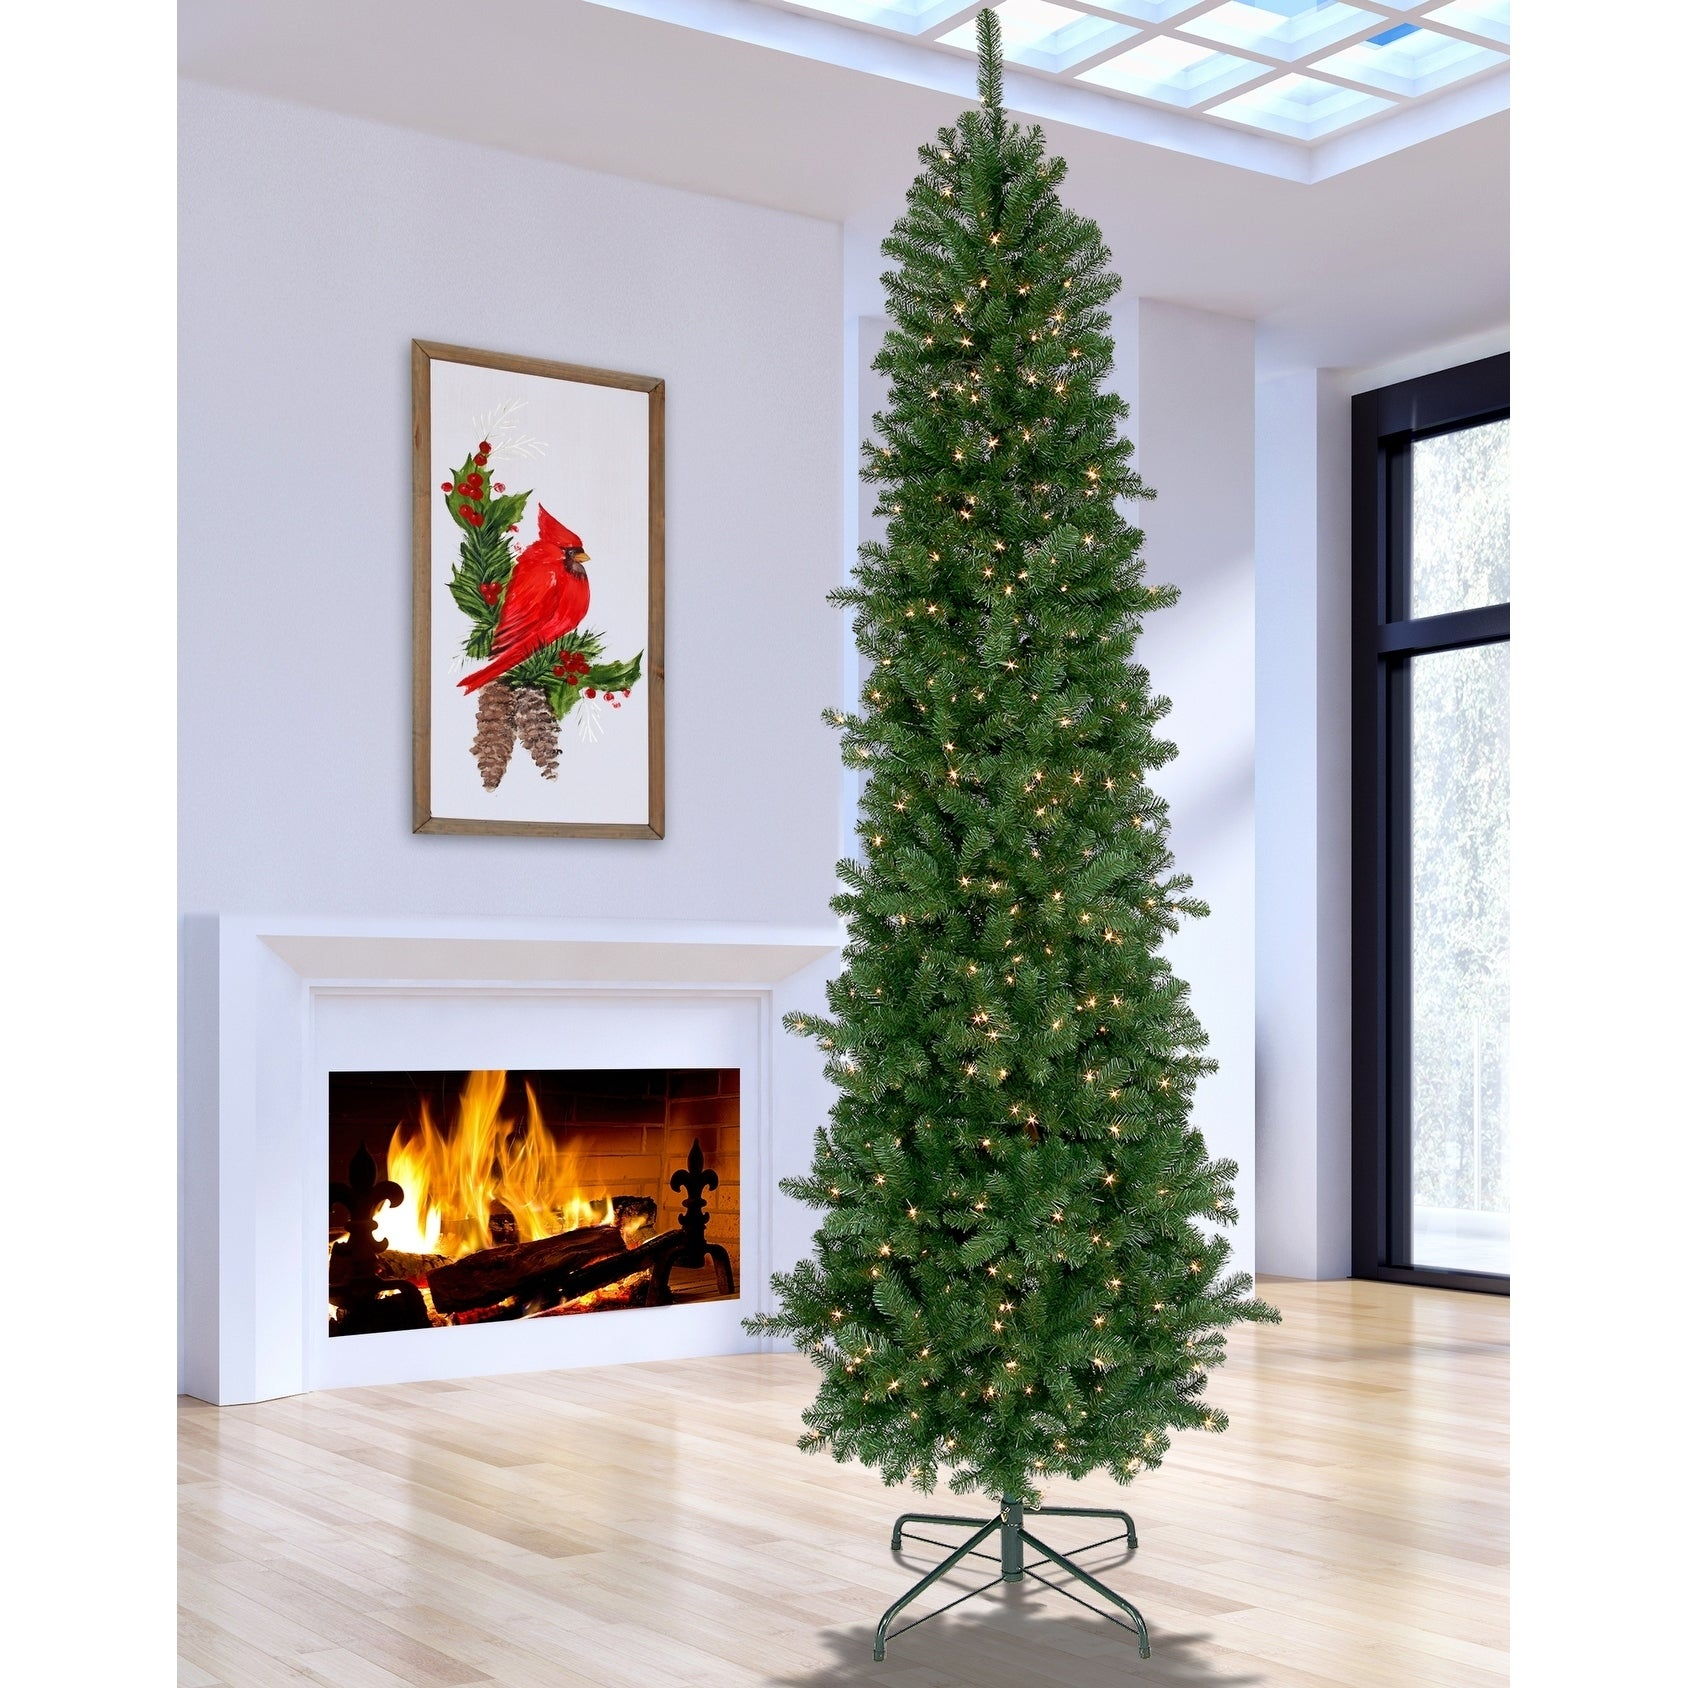 Tall Skinny Christmas Tree Silhouette.9 Ft Pre Lit Hudson Valley Pencil Tree